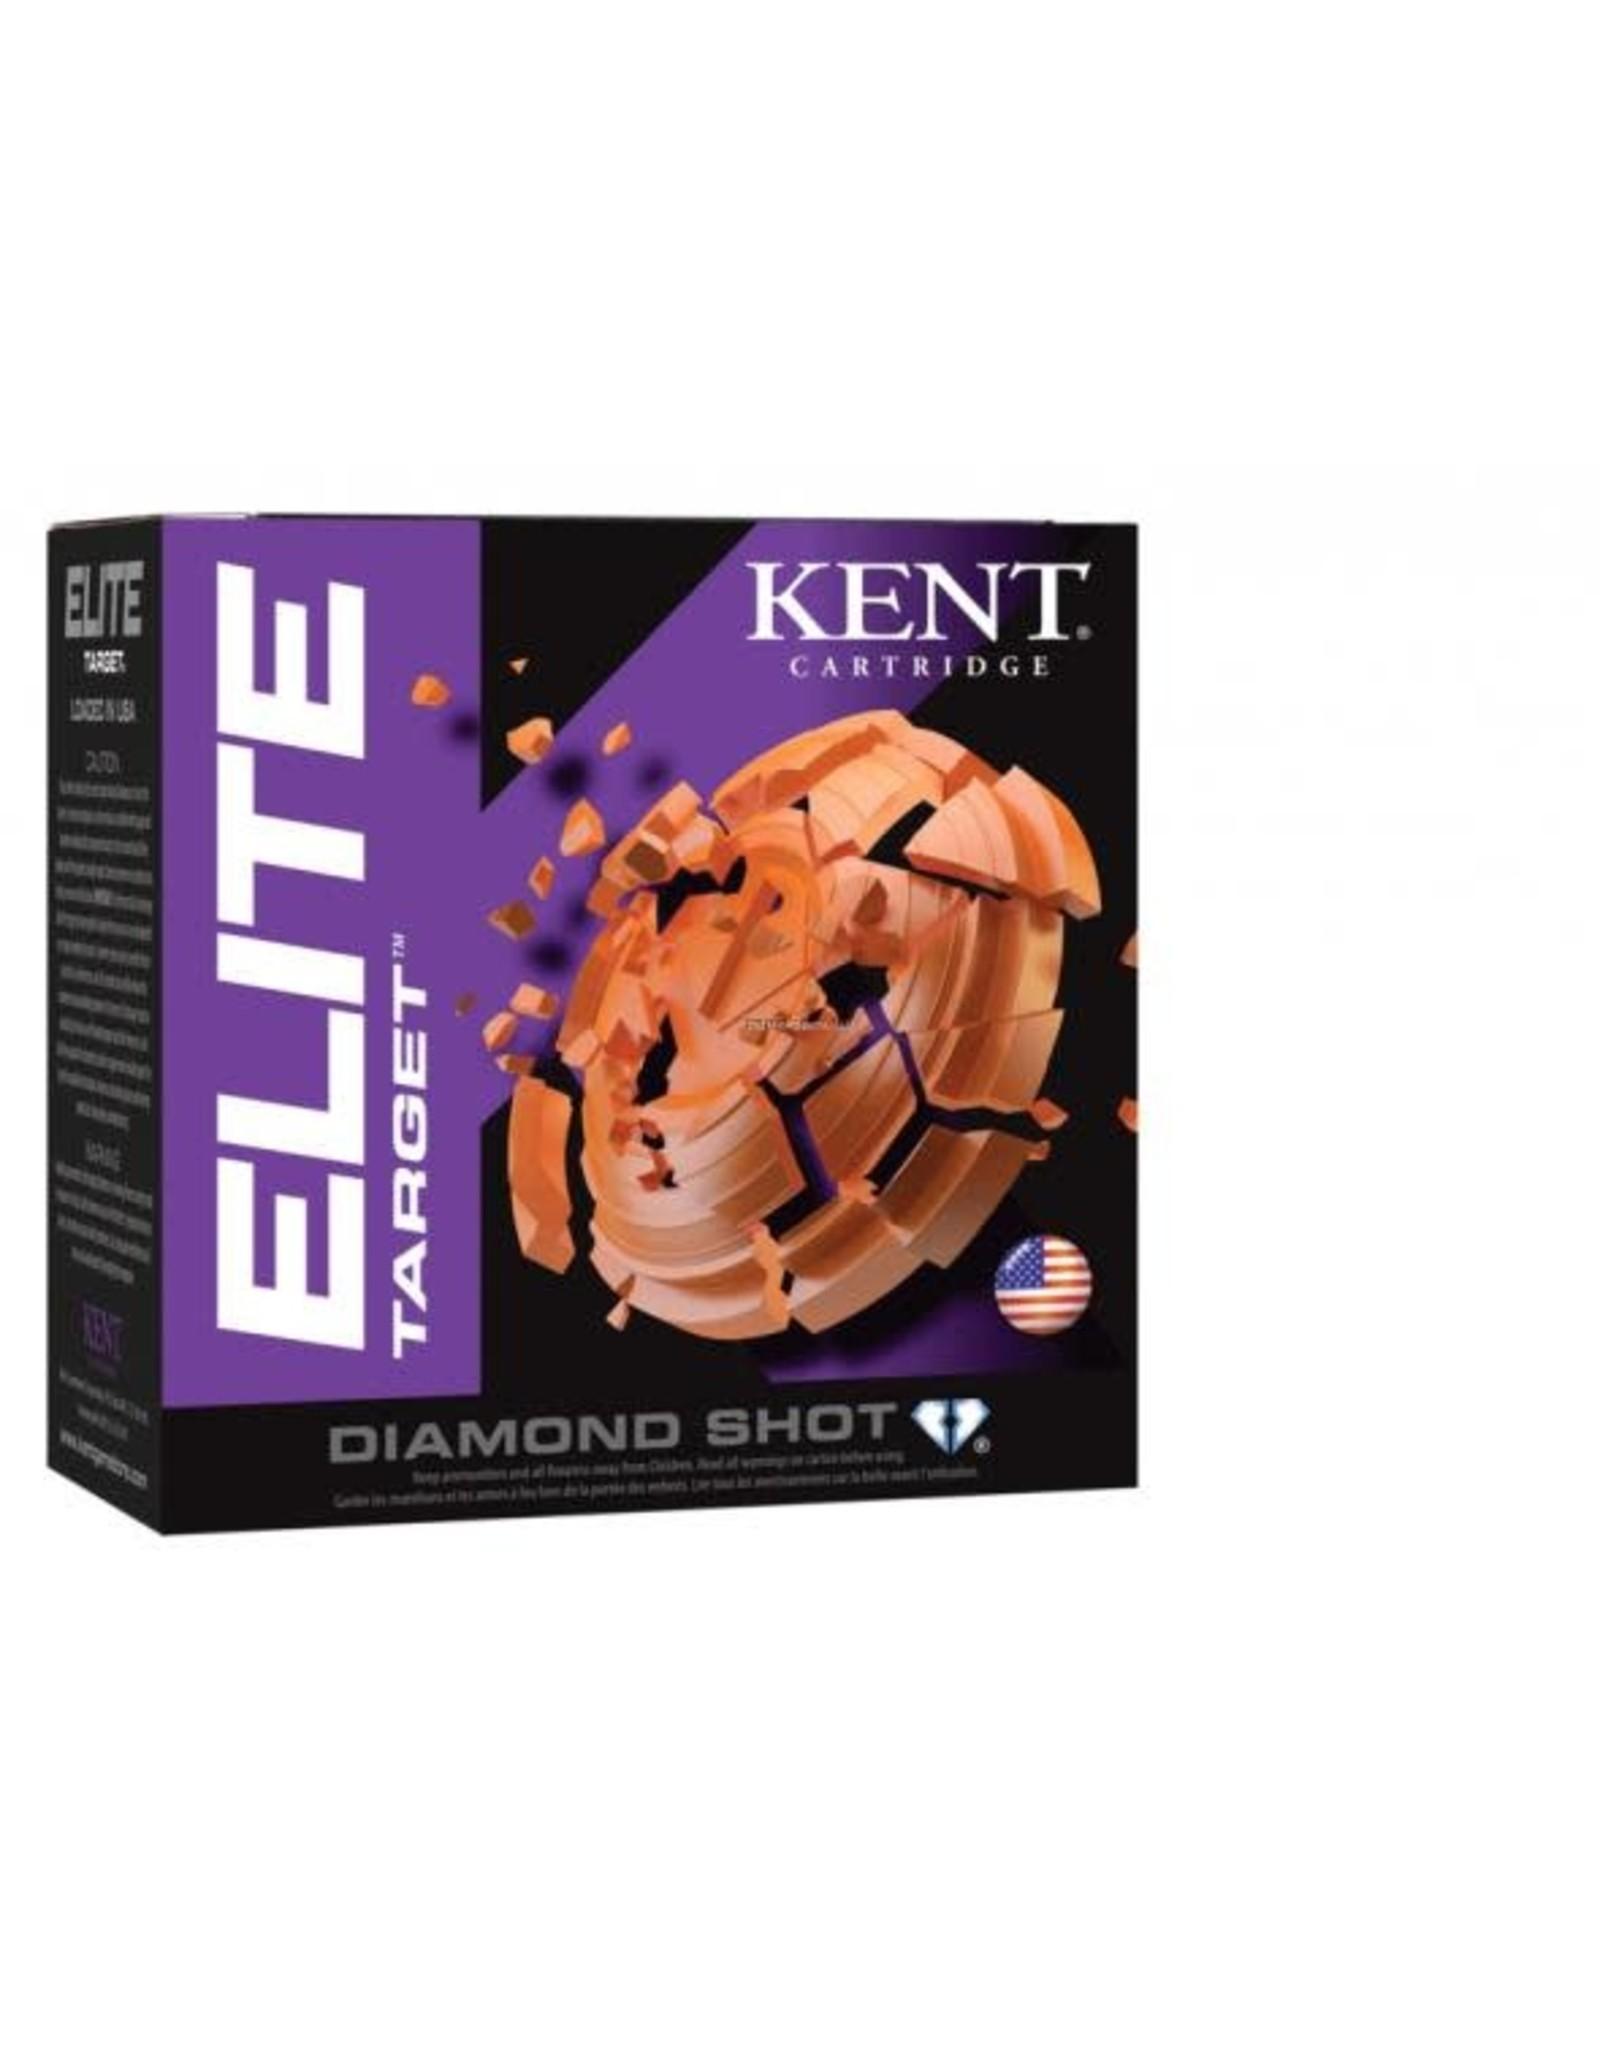 "KENT CARTRIDGE Kent Elite Target E12T32-7.5 12ga 2-3/4"", 1-1/8 Oz., #7.5 FPS 1150"